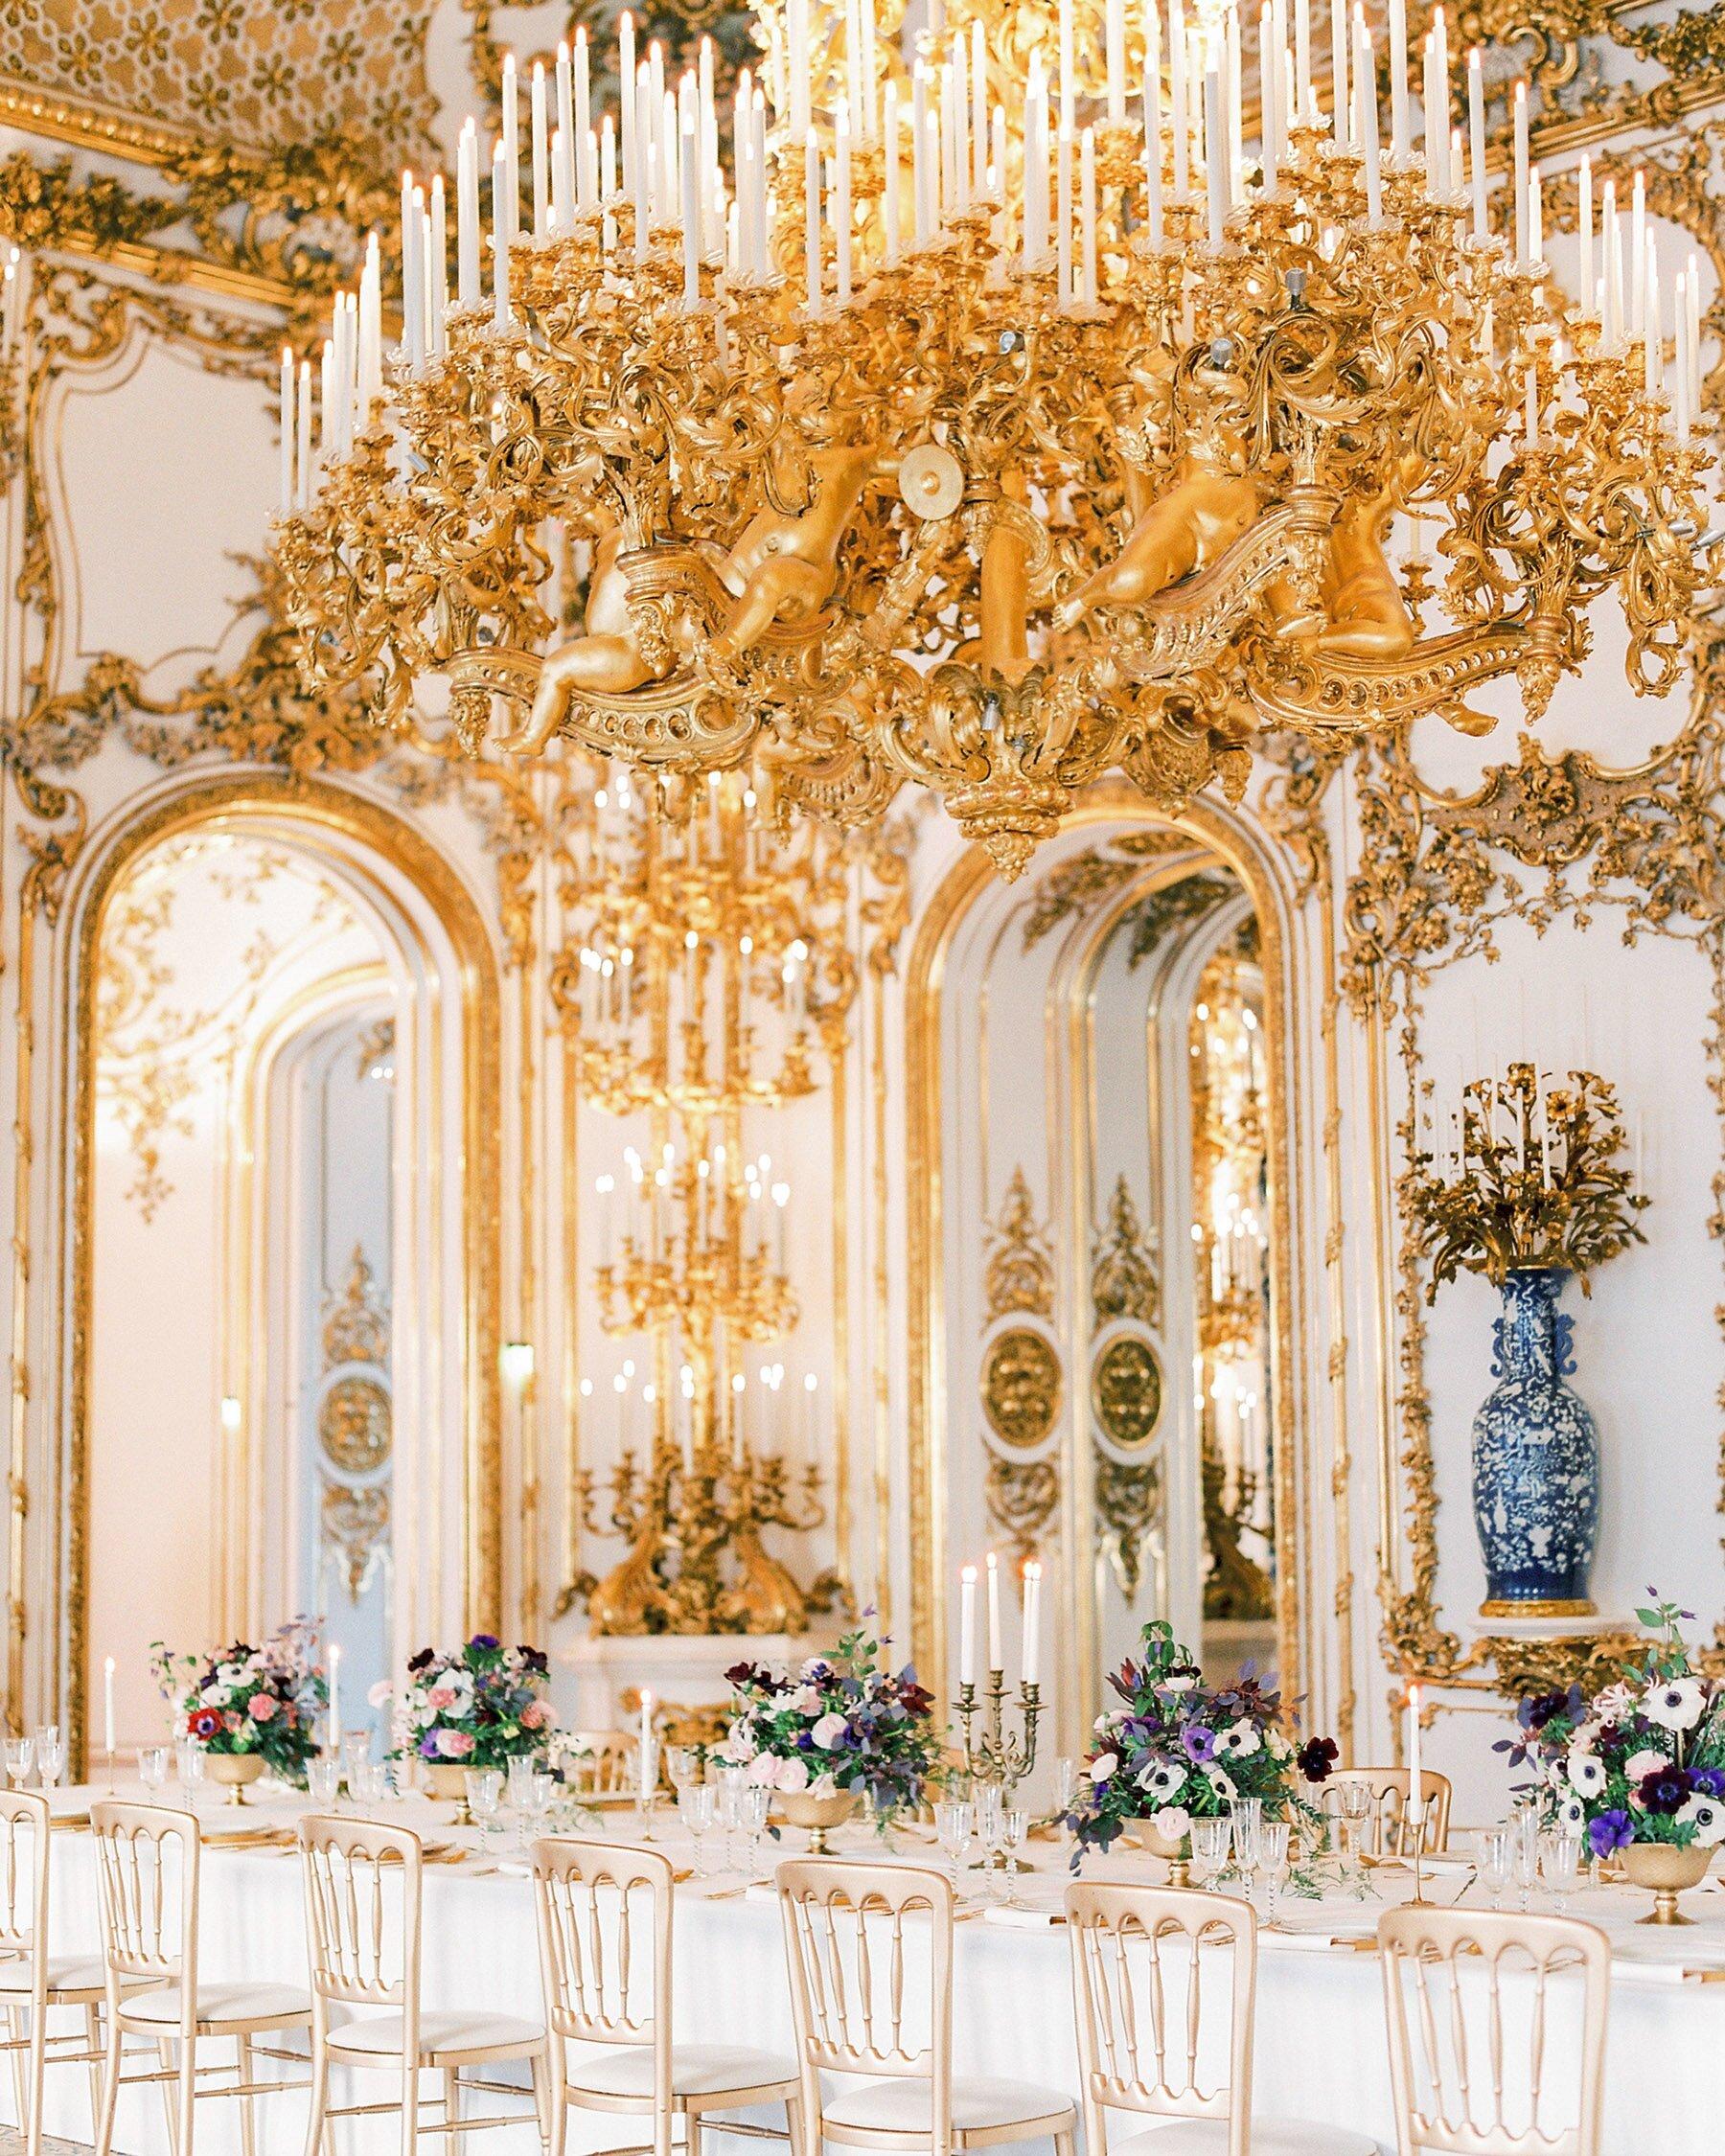 23 Glamorous Wedding Ideas for Your Luxurious Big Day | Martha ...